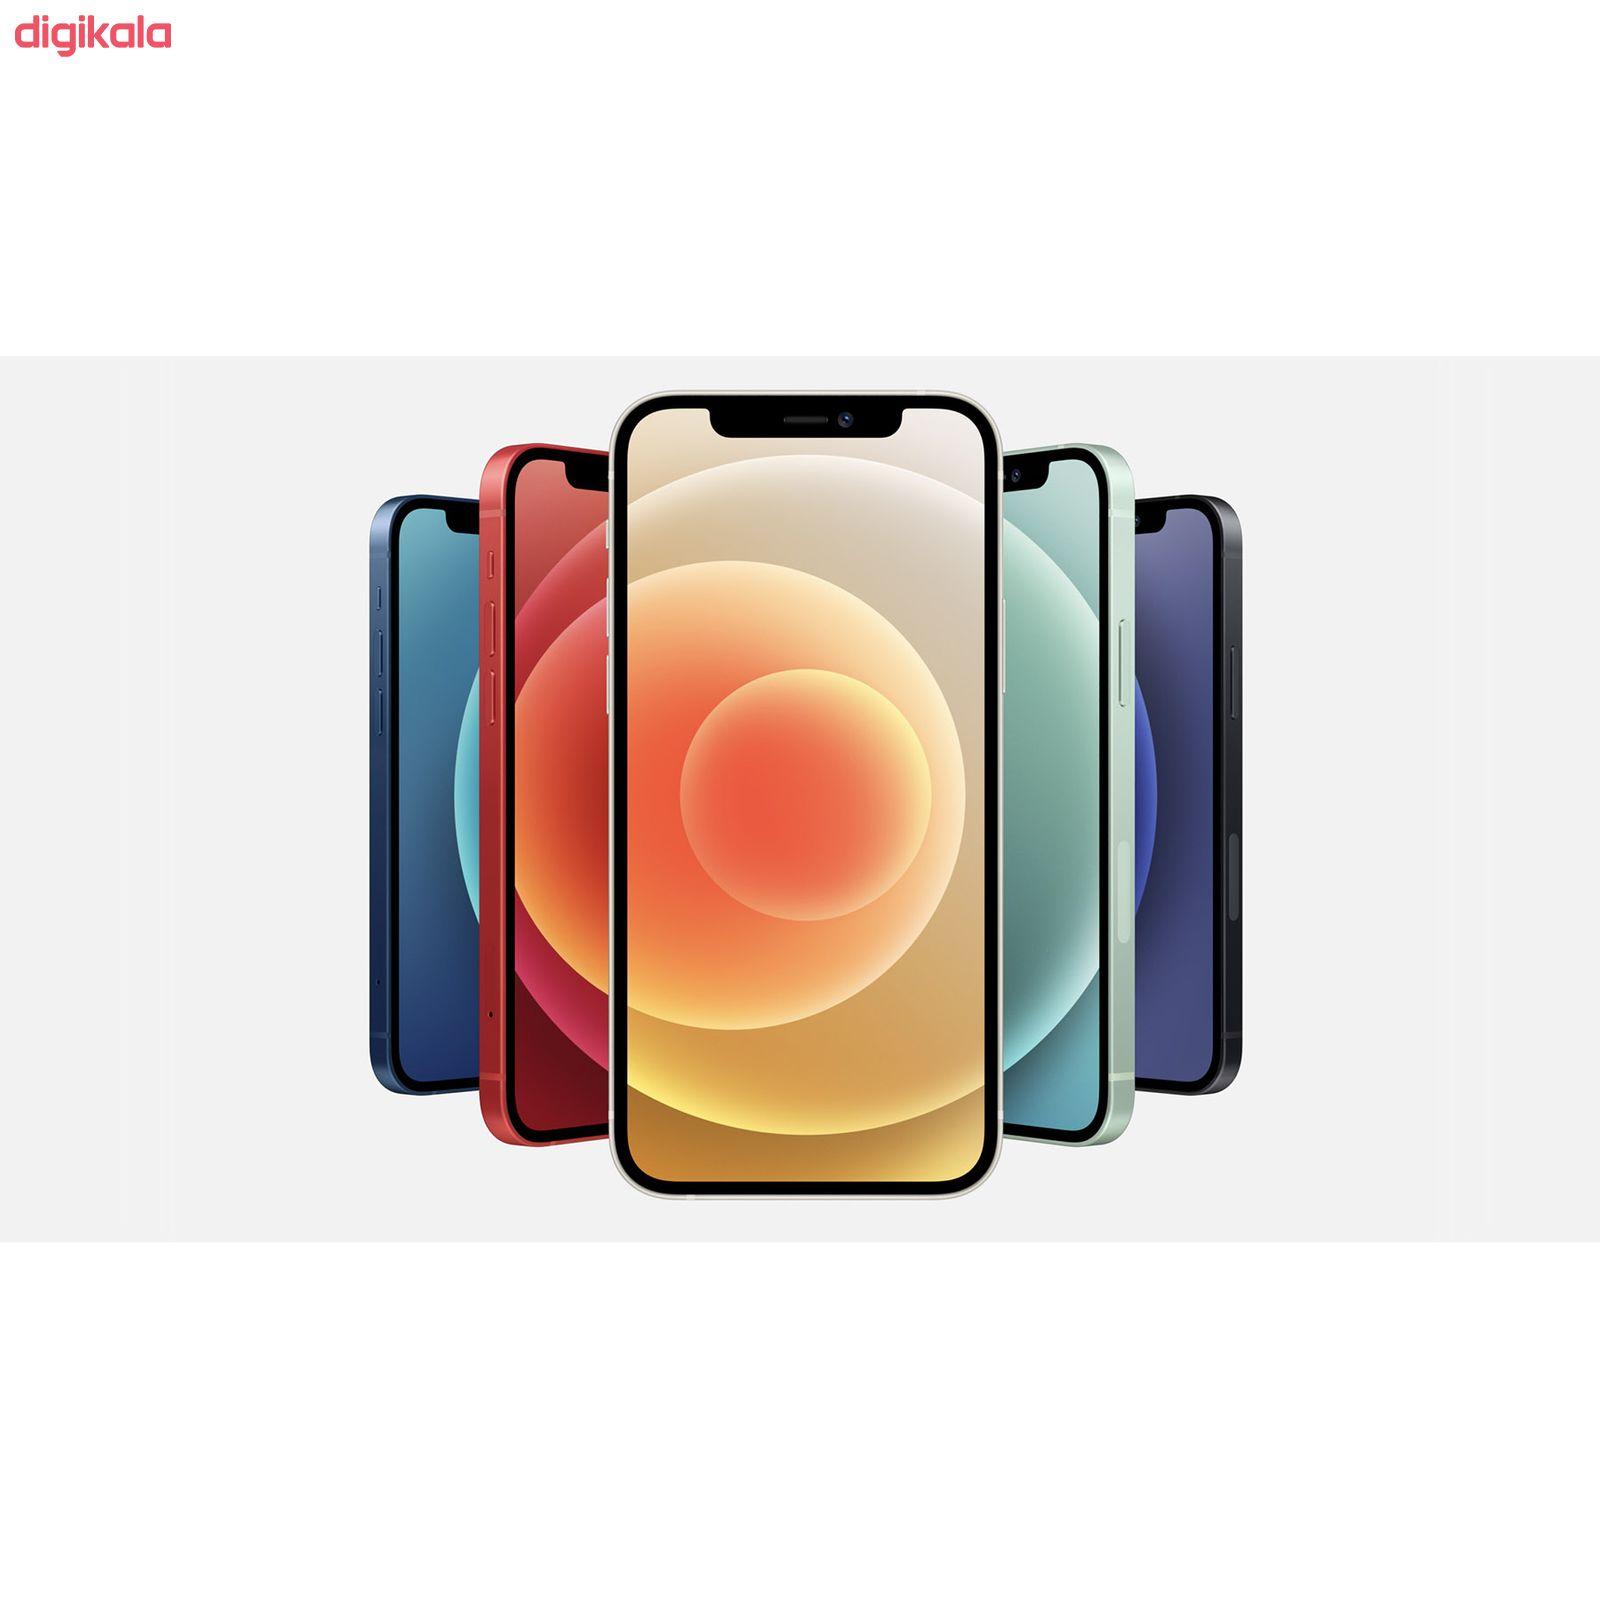 گوشی موبایل اپل مدل iPhone 12 A2404 دو سیم کارت ظرفیت 256 گیگابایت  main 1 17